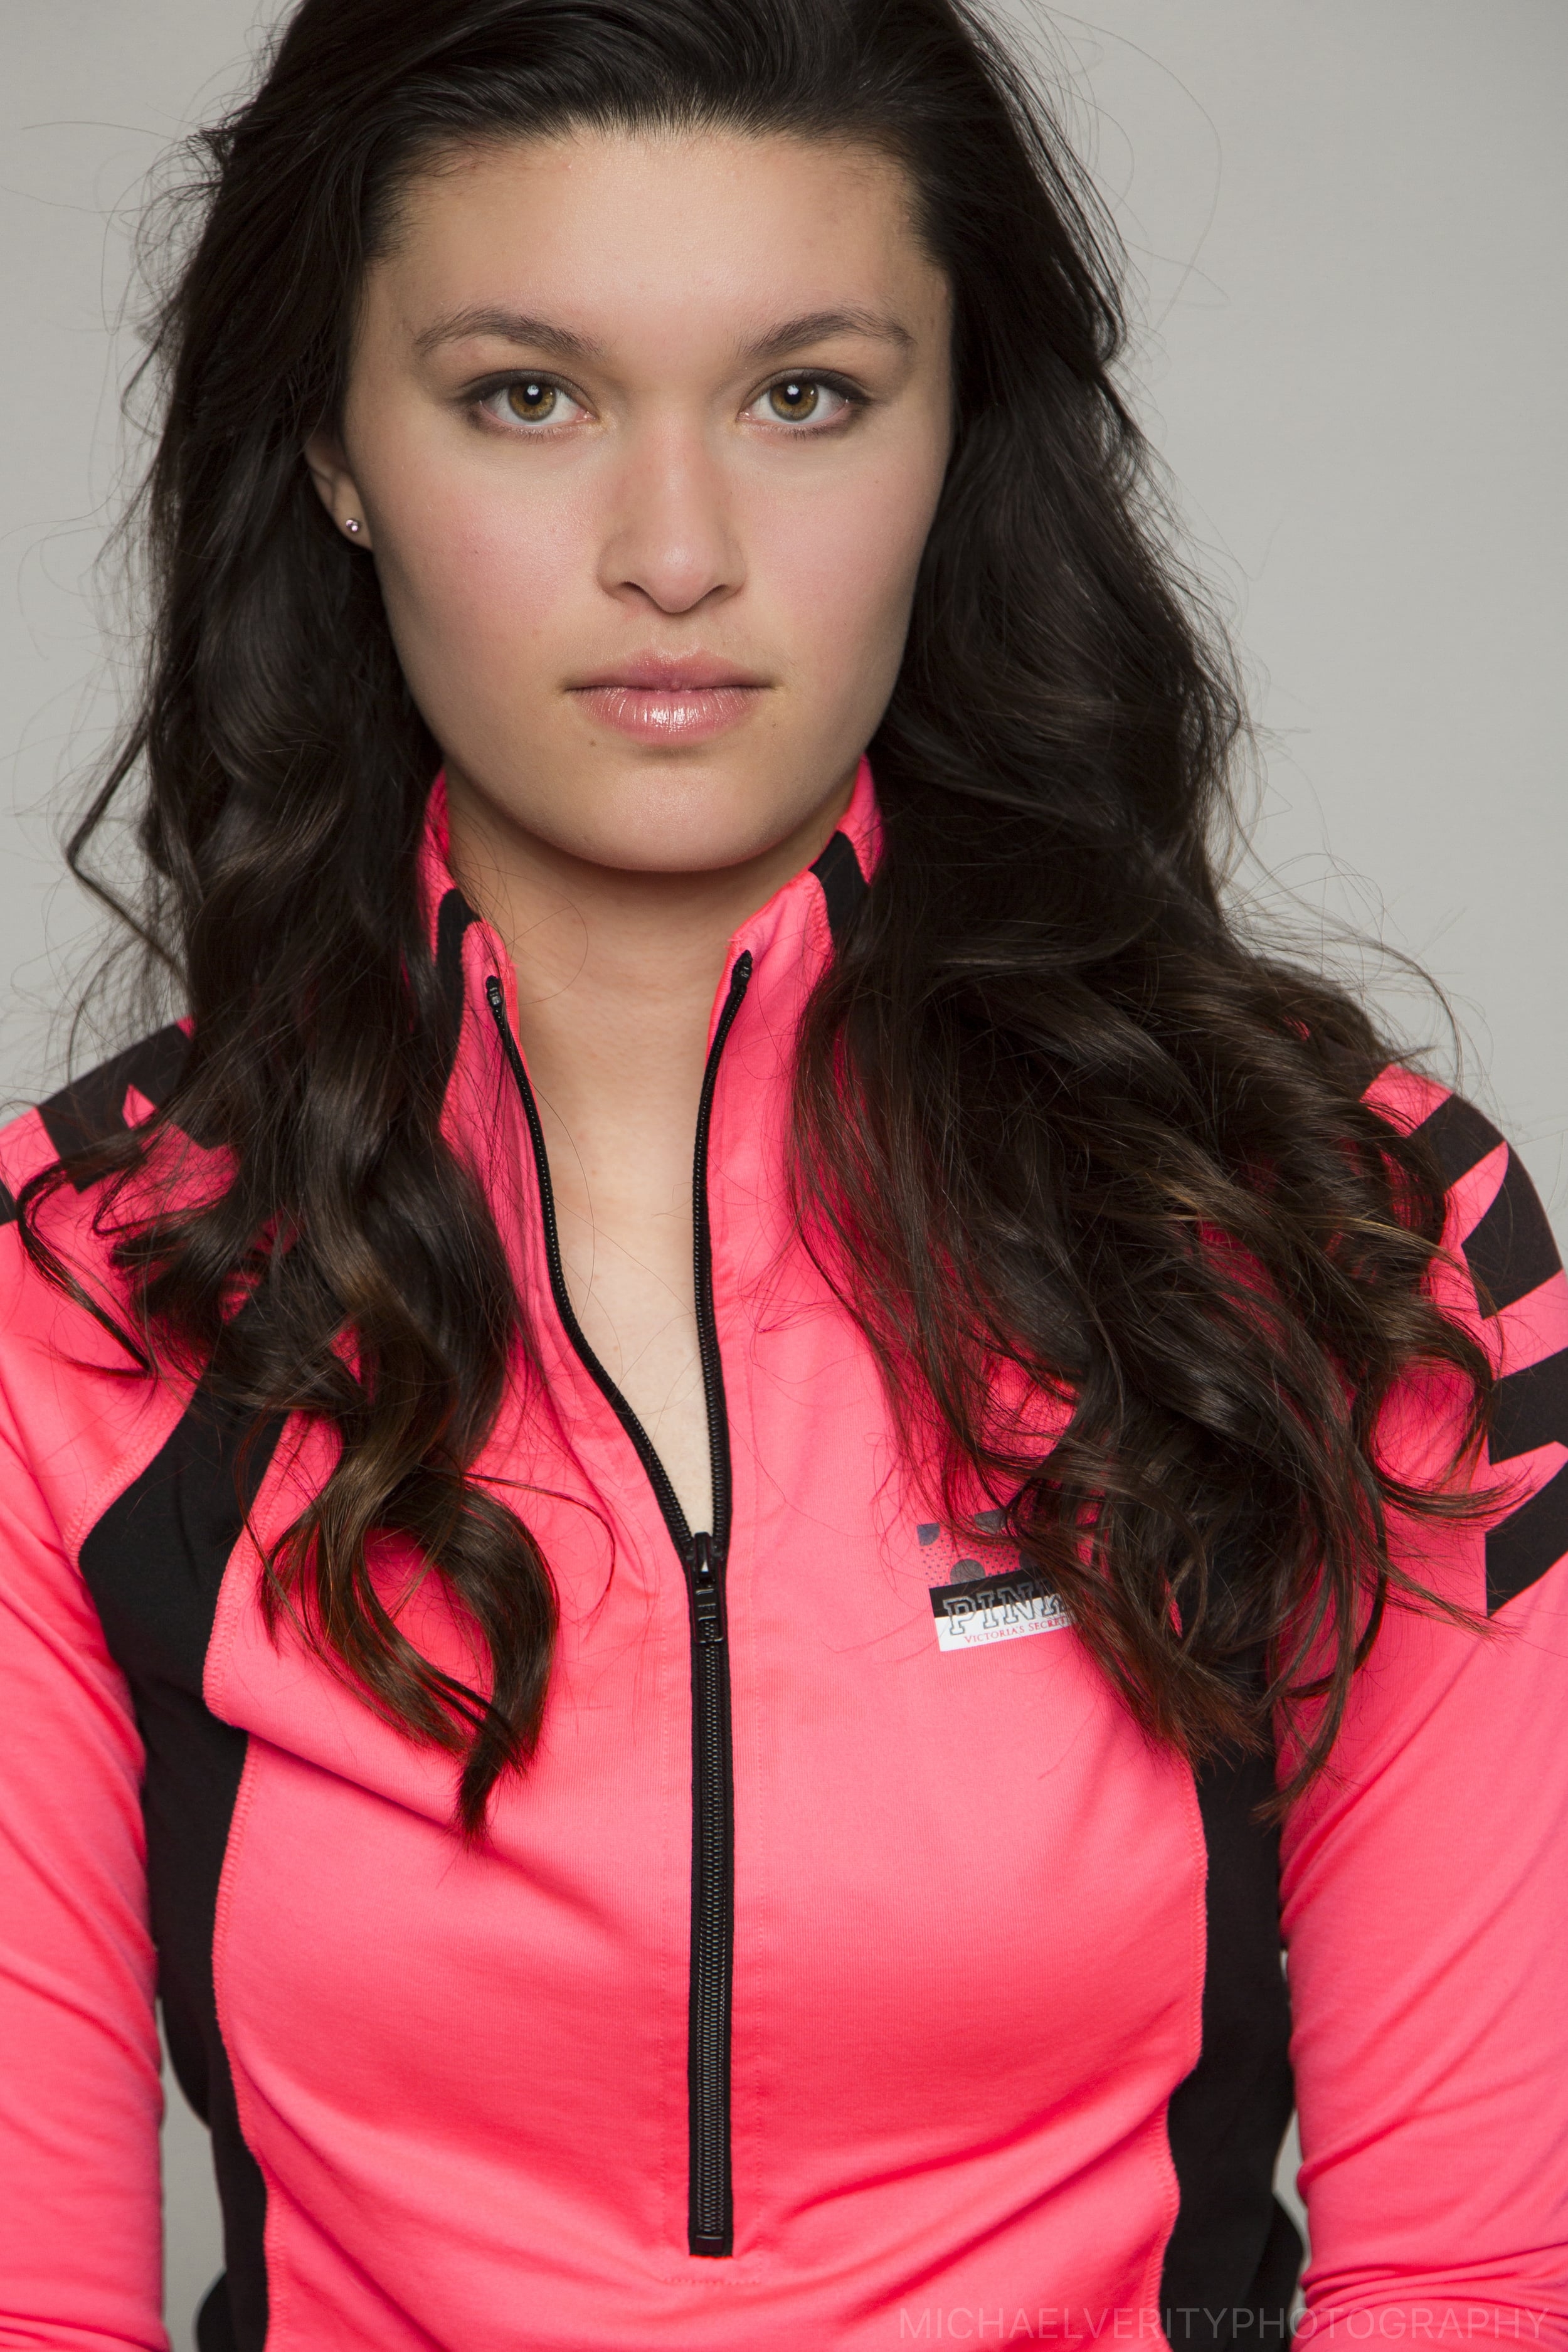 Nicole-Portland-Vancouver-Modeling-Portfolio-Fashion-Photography-Michael-Verity